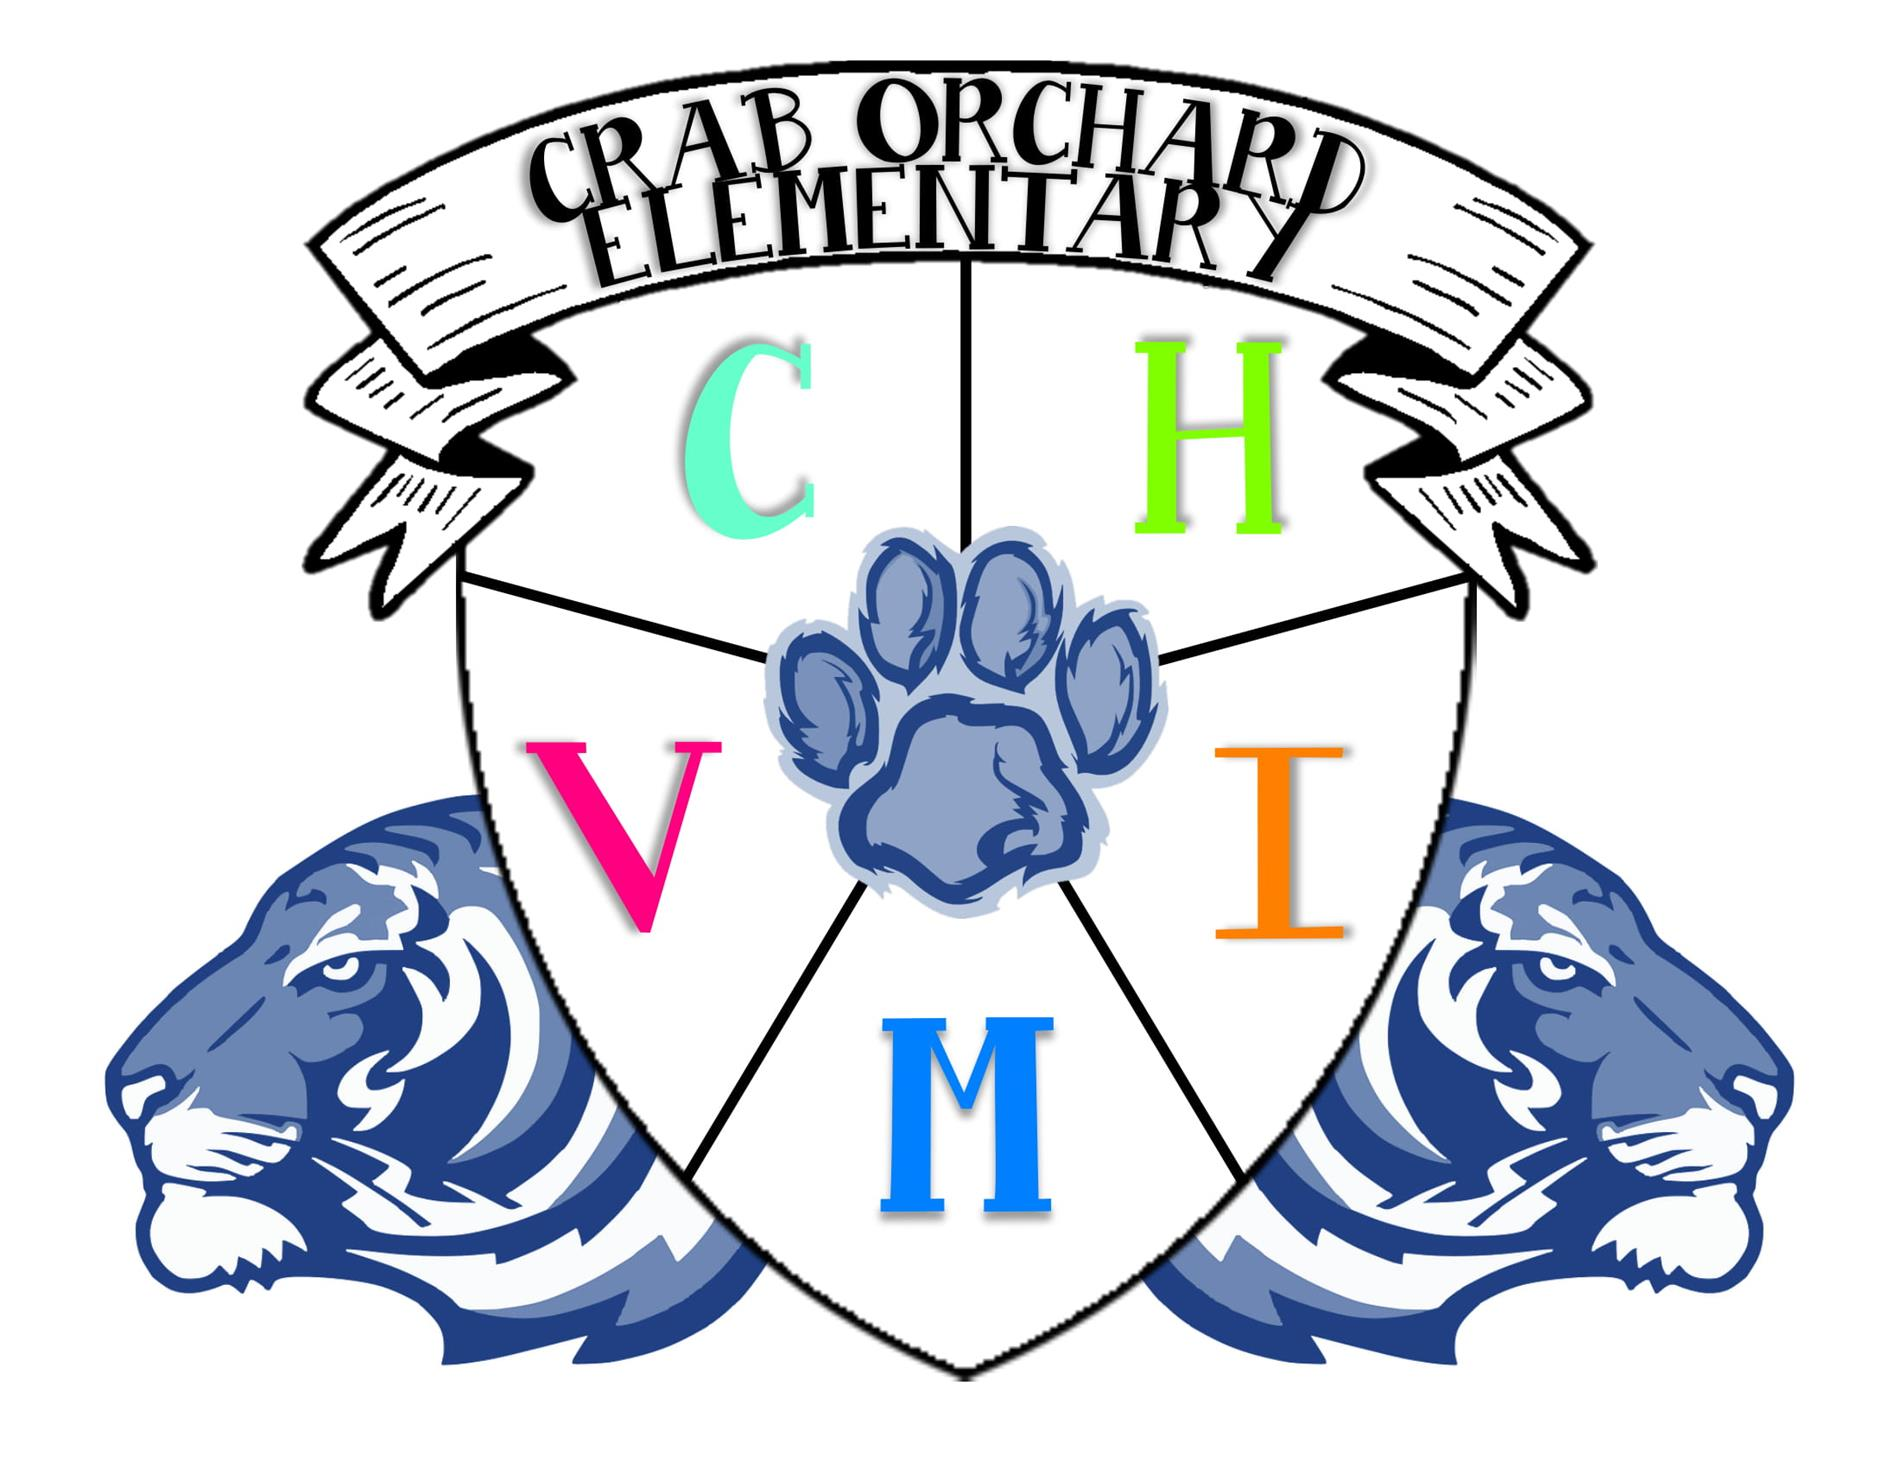 Crab Orchard School crest